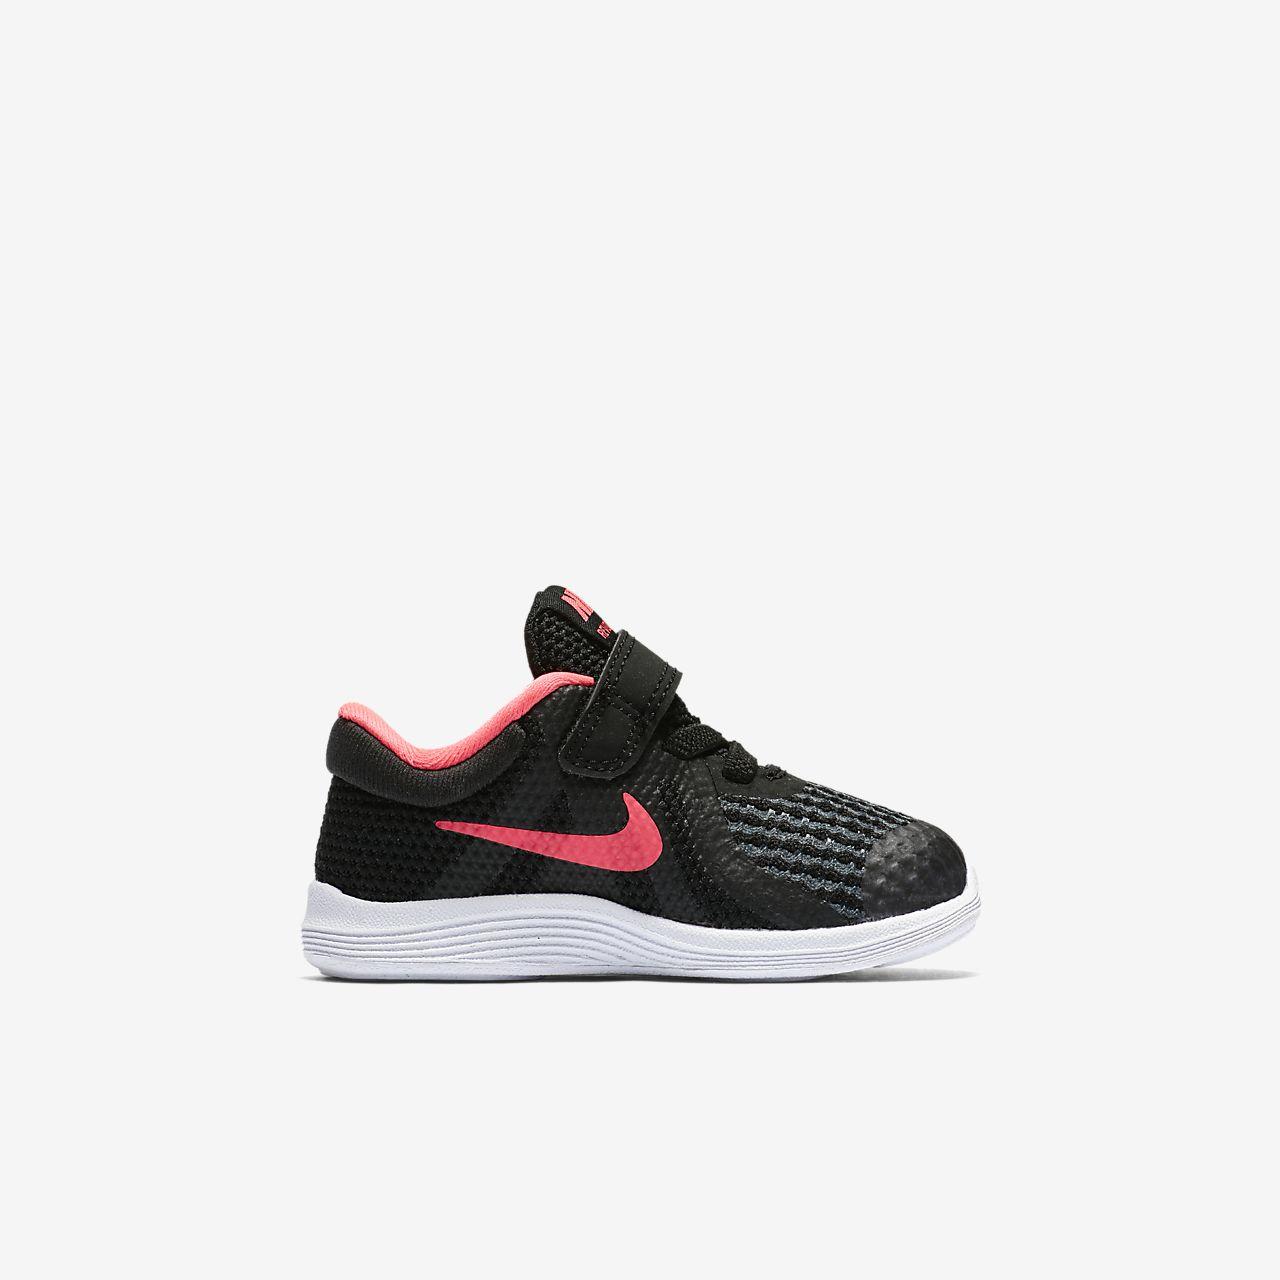 7da31b501fa Chaussure Nike Revolution 4 pour Bébé Petit enfant. Nike.com FR